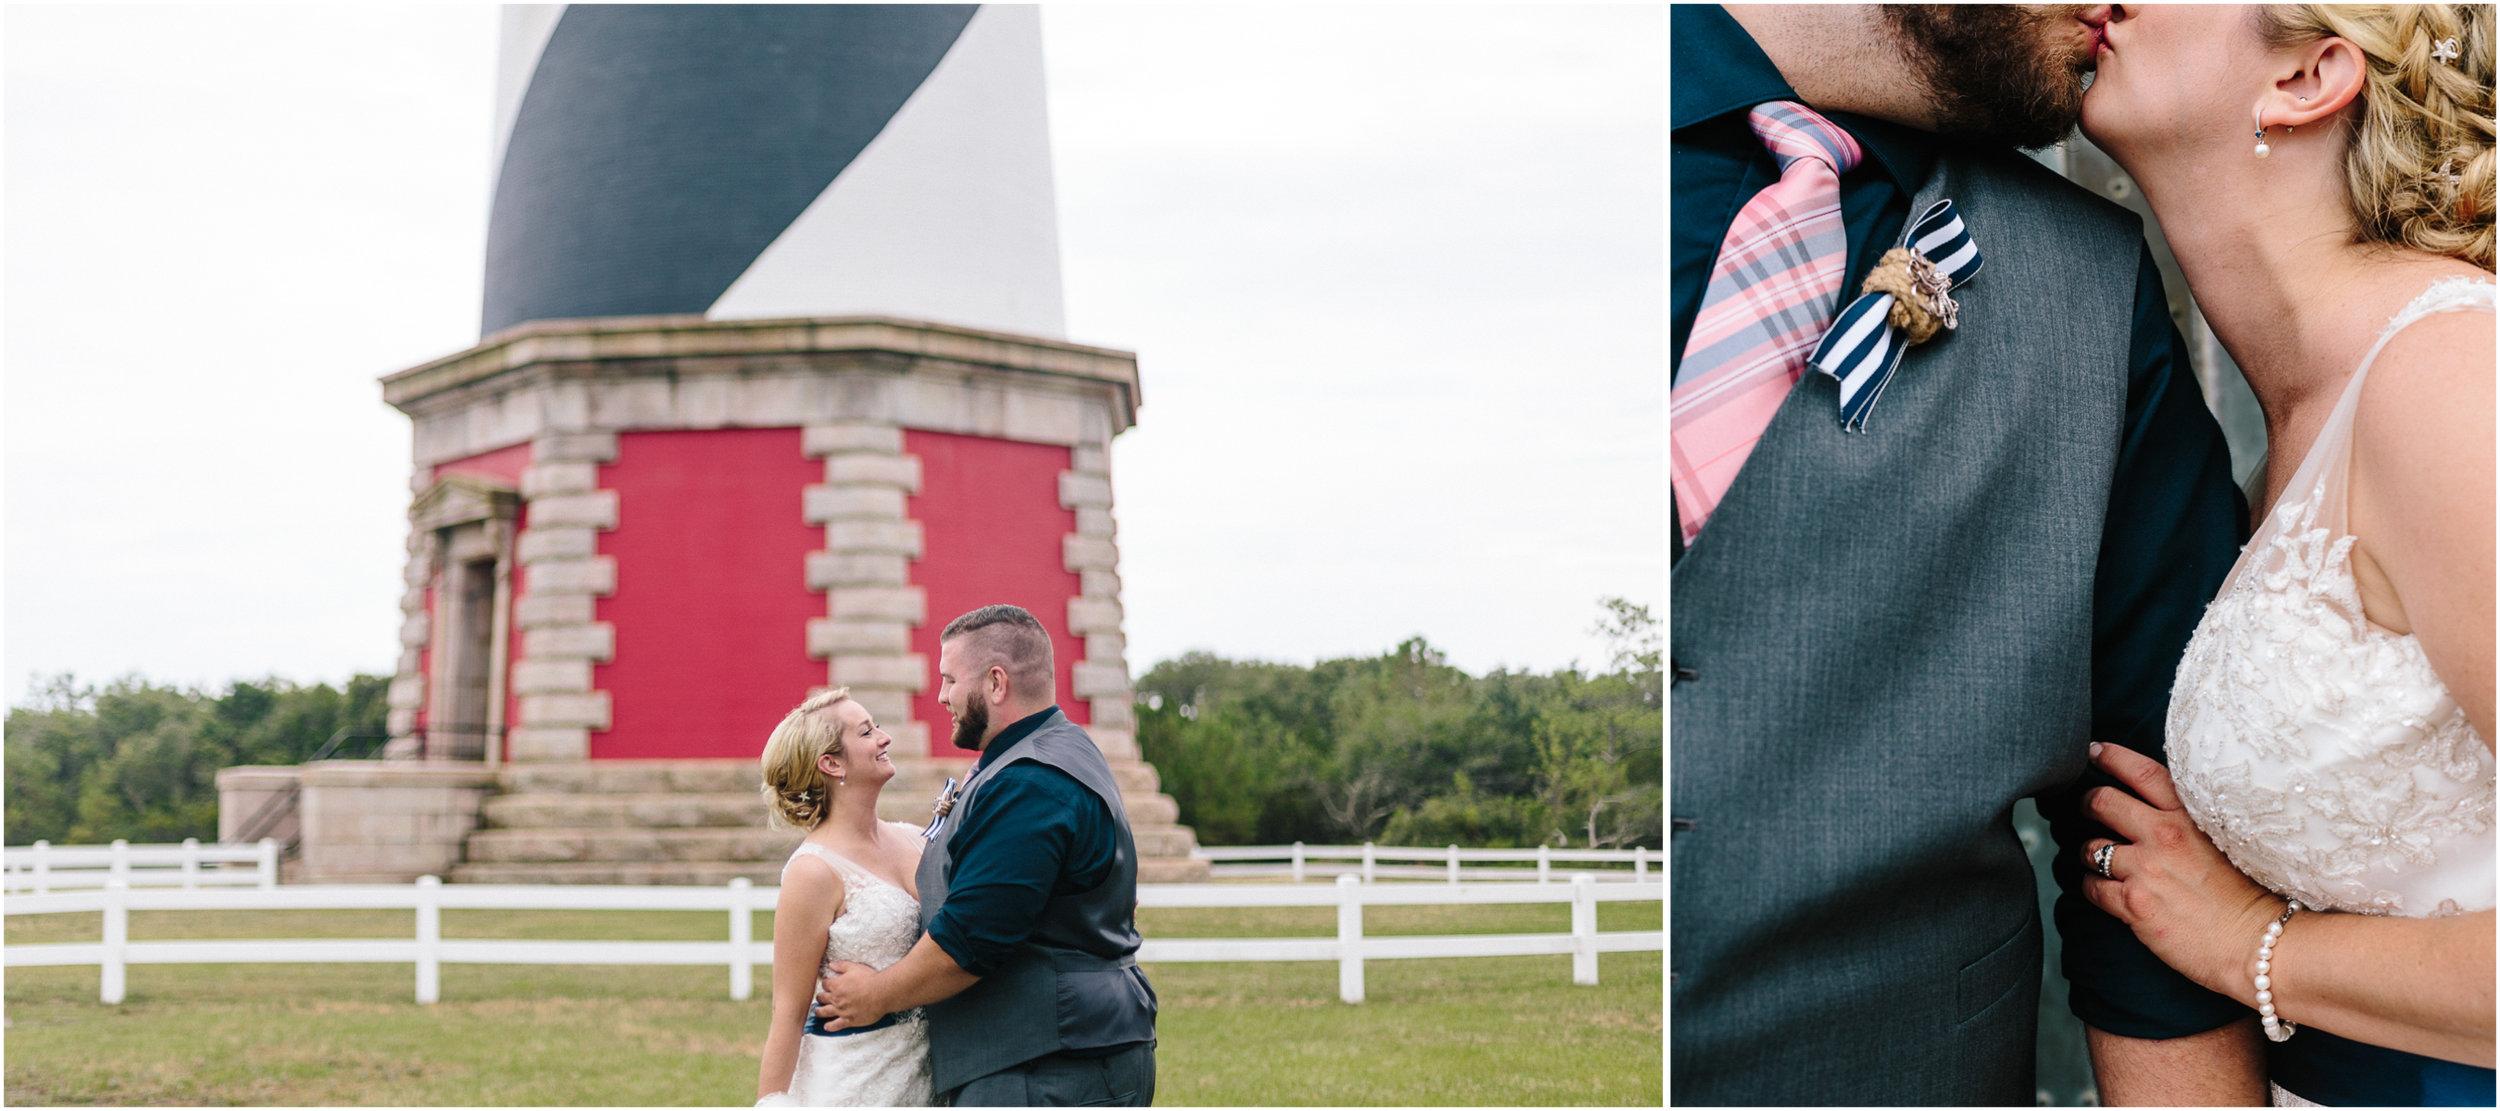 alyssa barletter photography buxton north carolina outer banks obx cape hatteras elopement intmate beach wedding-41.jpg